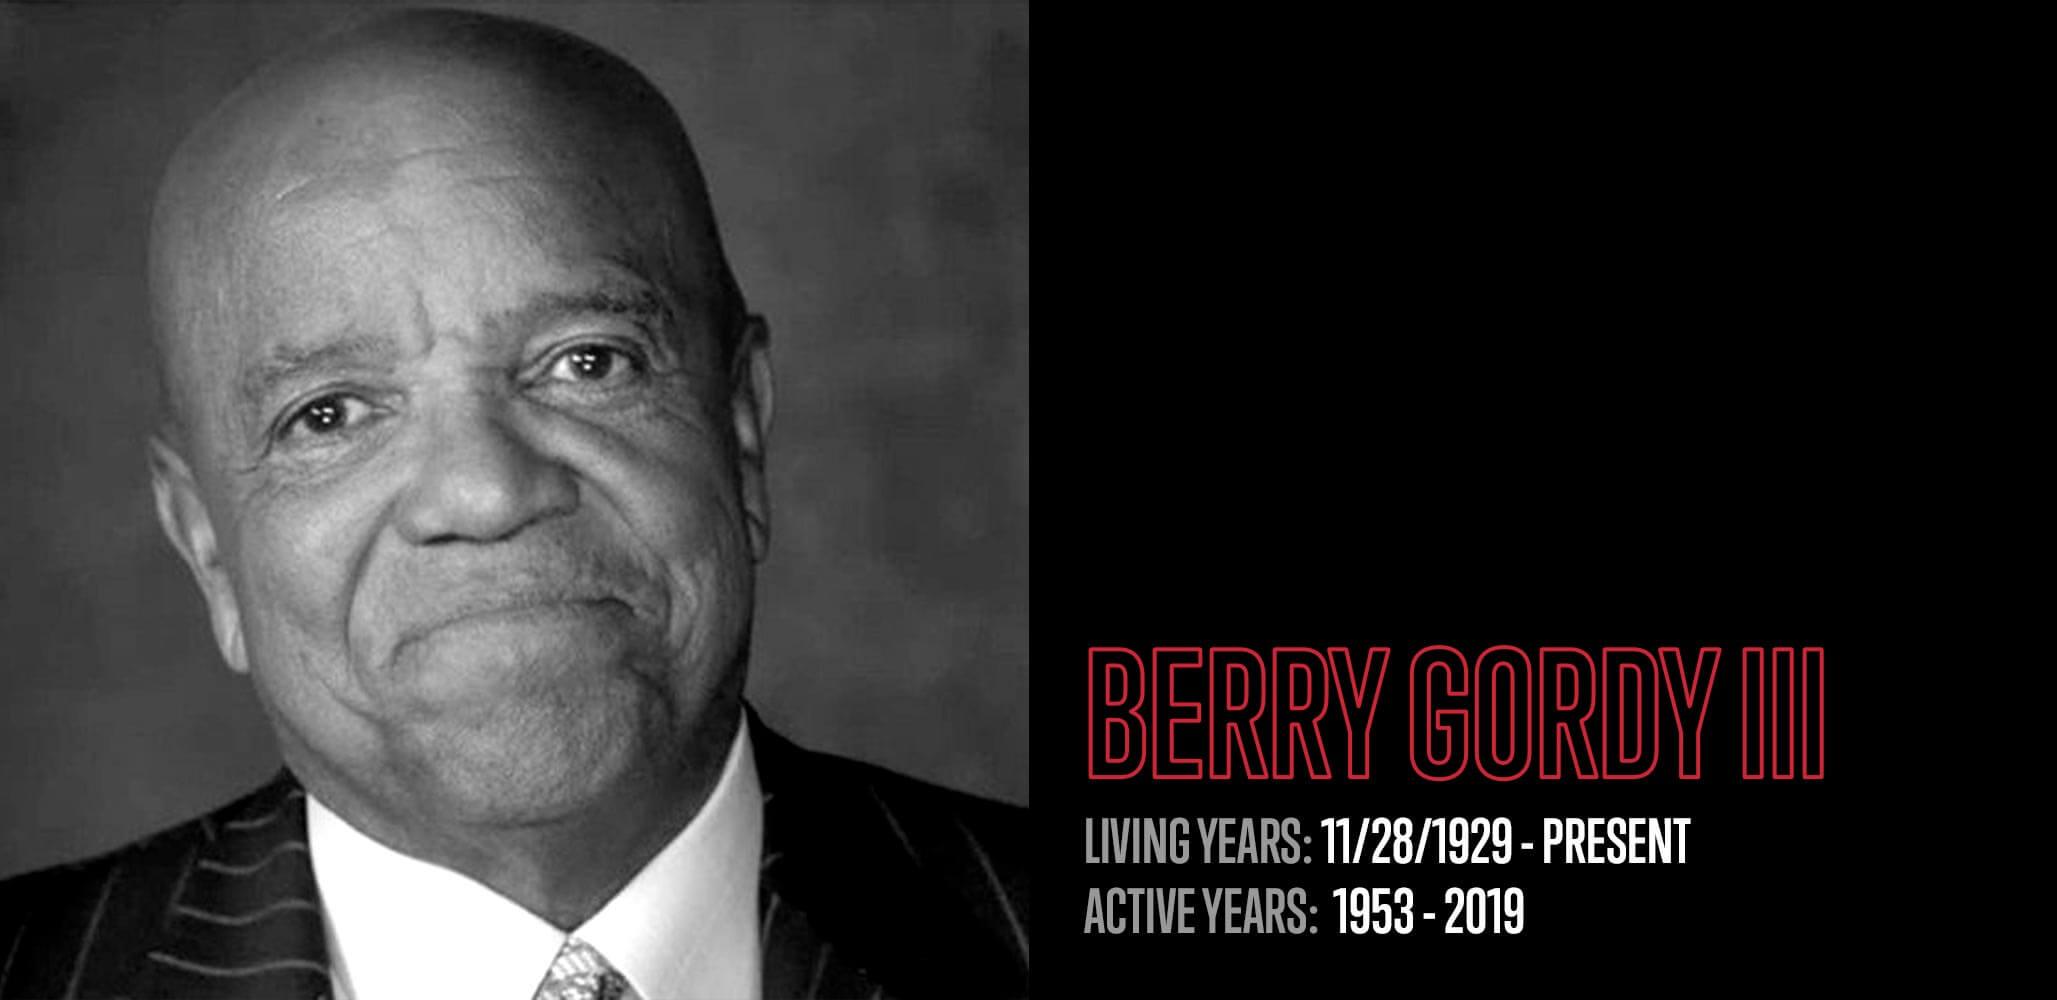 Berry Gordy III